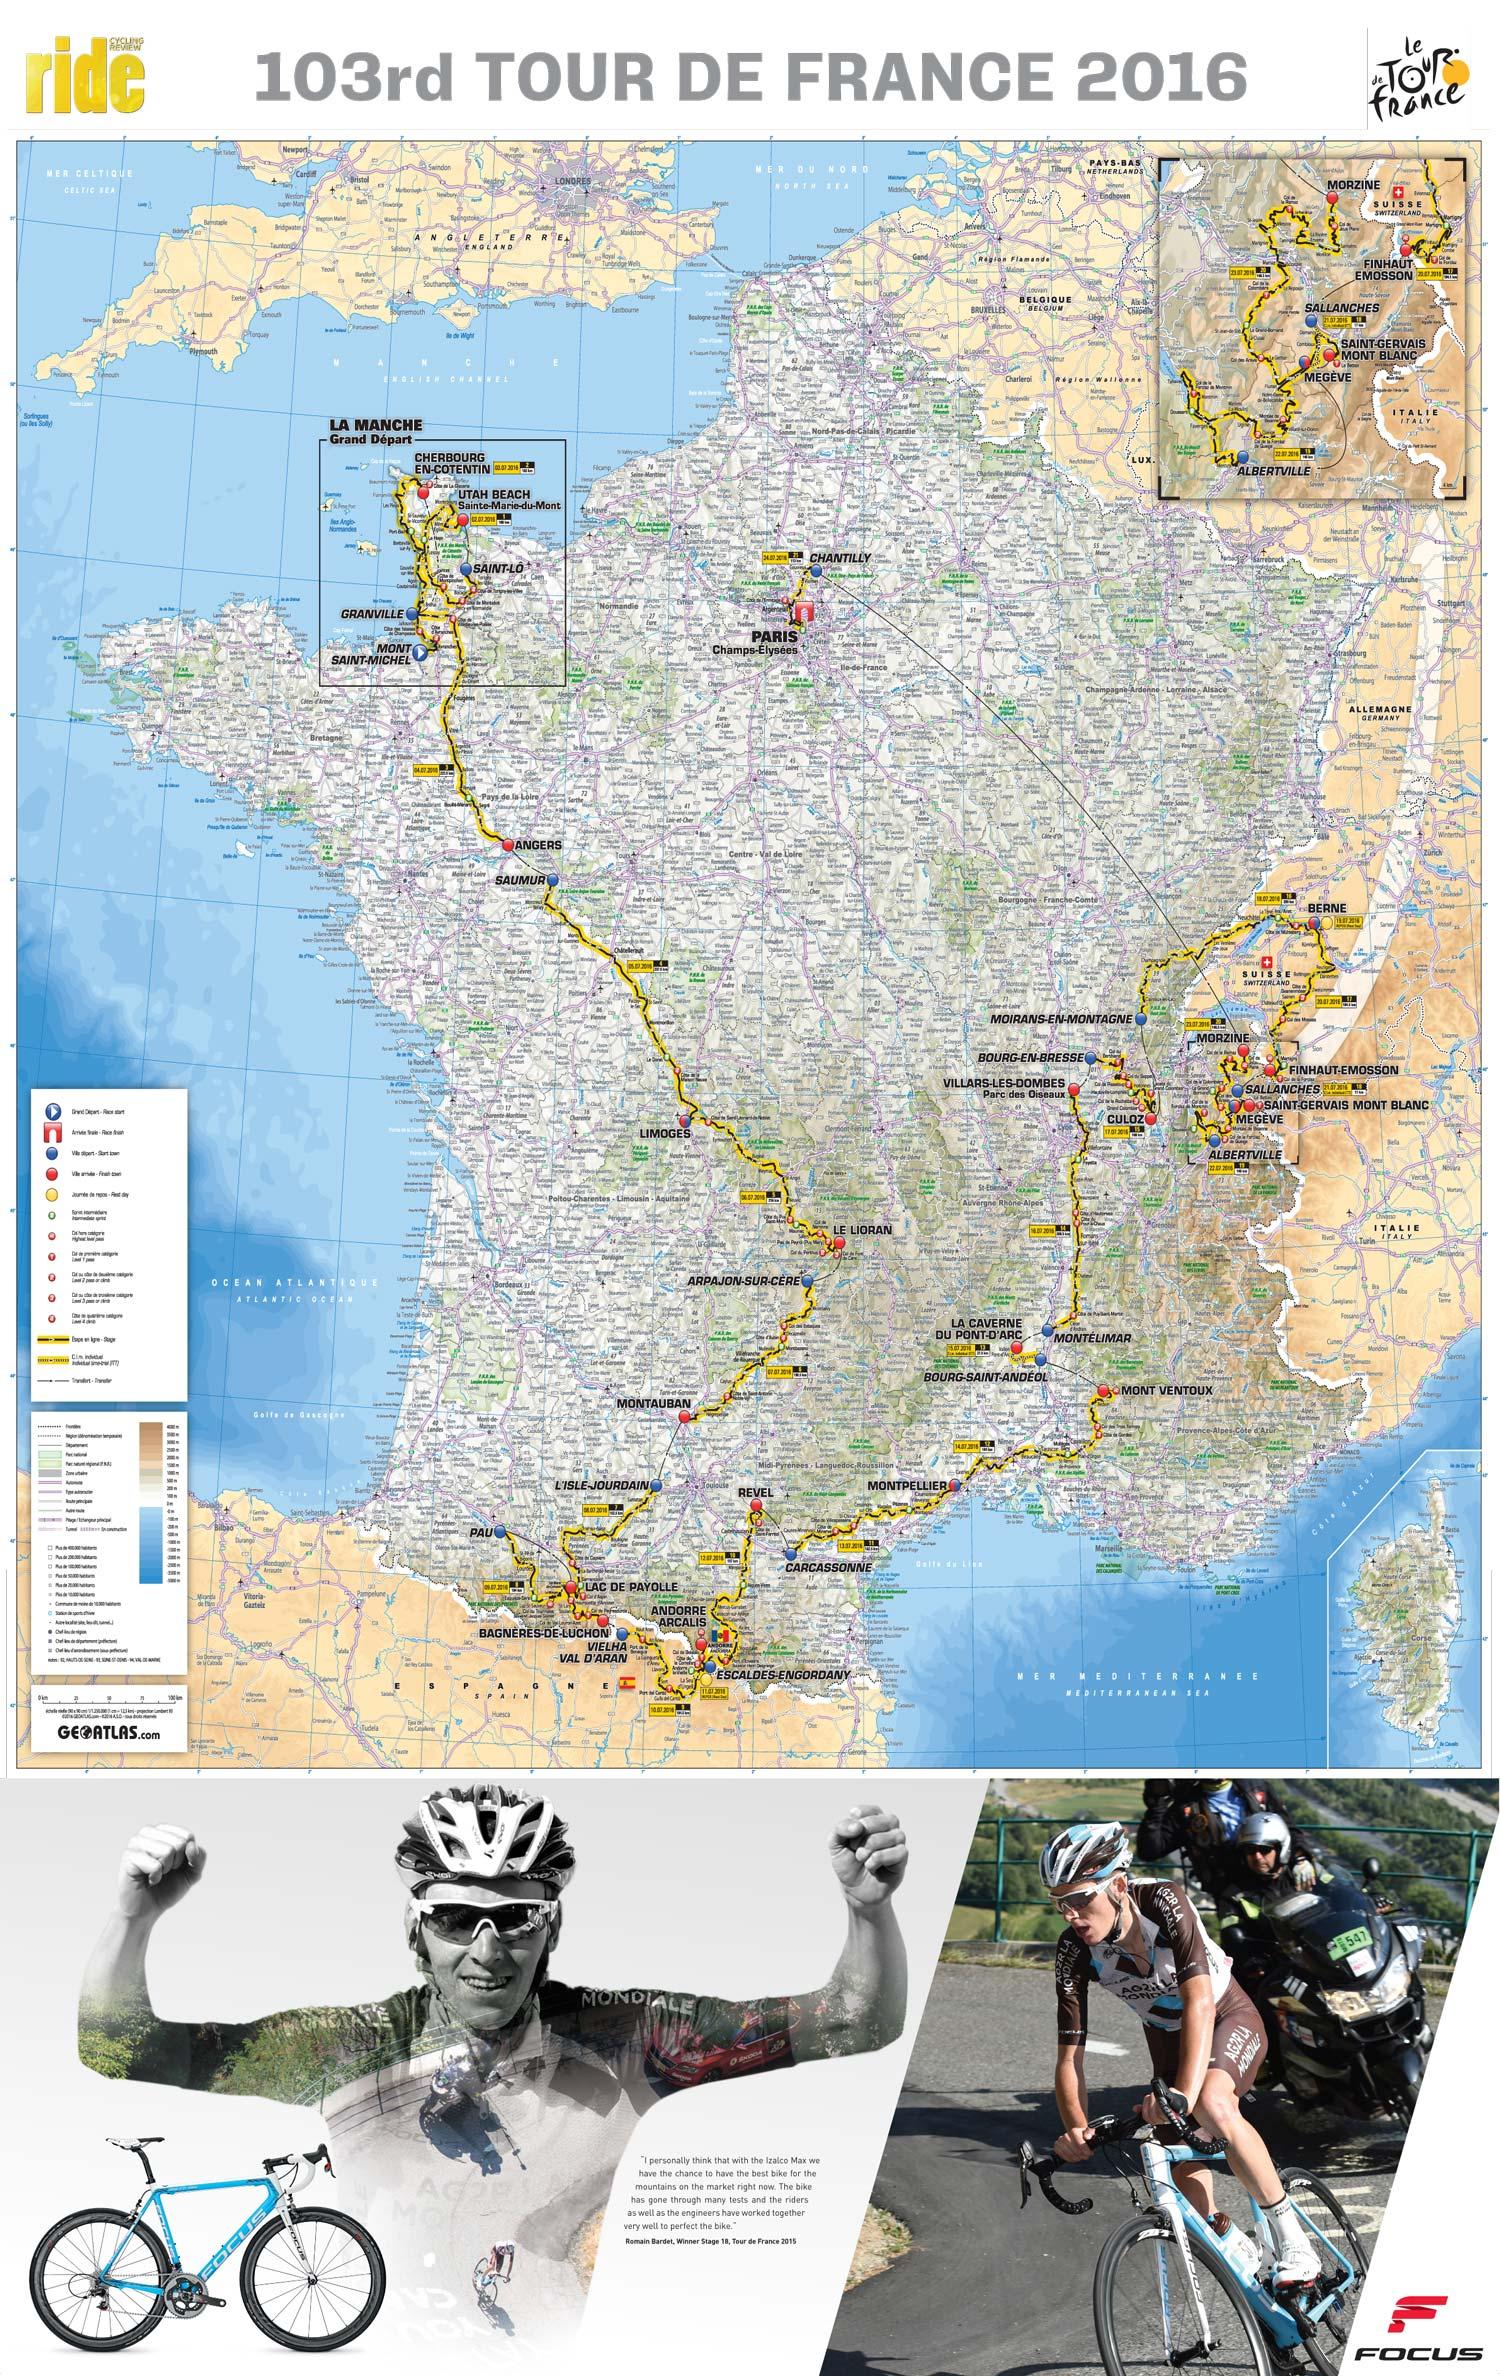 TdFG2016_Map_Poster_P001